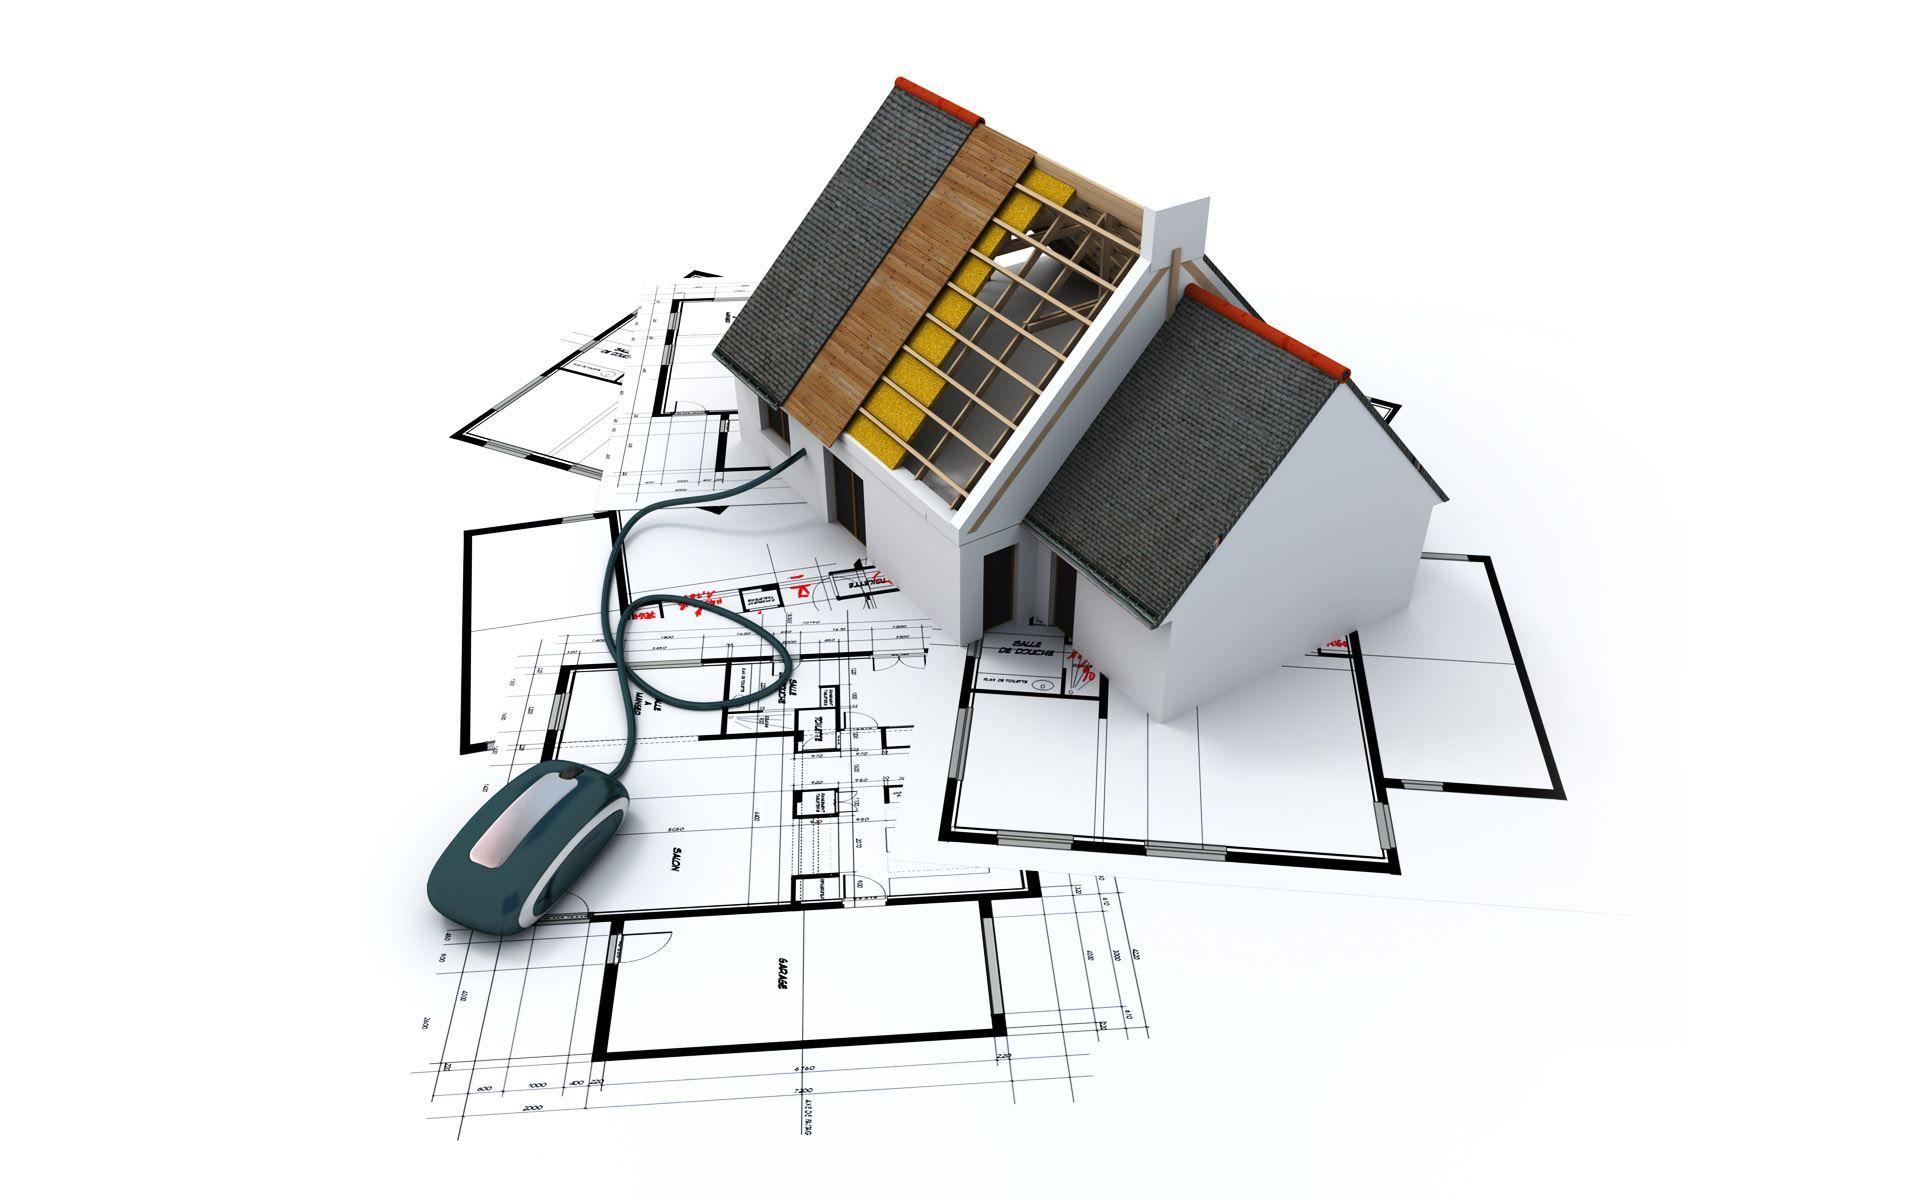 Elegant 10 Key Enterprise Skills Of A Professional Architect. Online  ArchitectArchitect DesignArchitecture PostersDesign ServicesThis ...